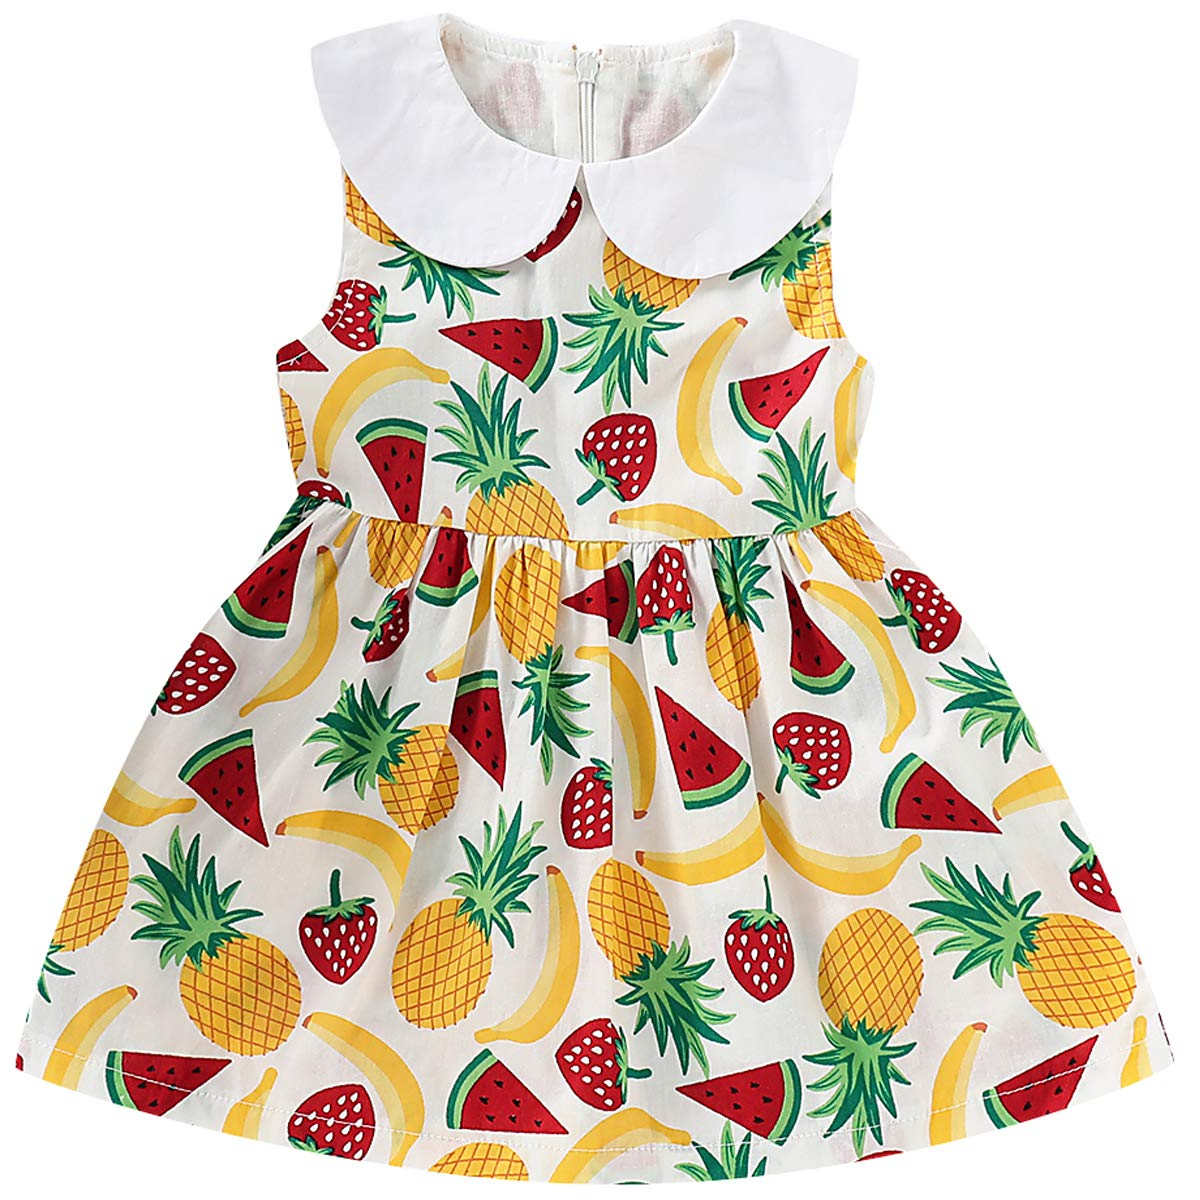 Toddler Baby Girls Peter Pan Collar Dress Swing Casual Sundress